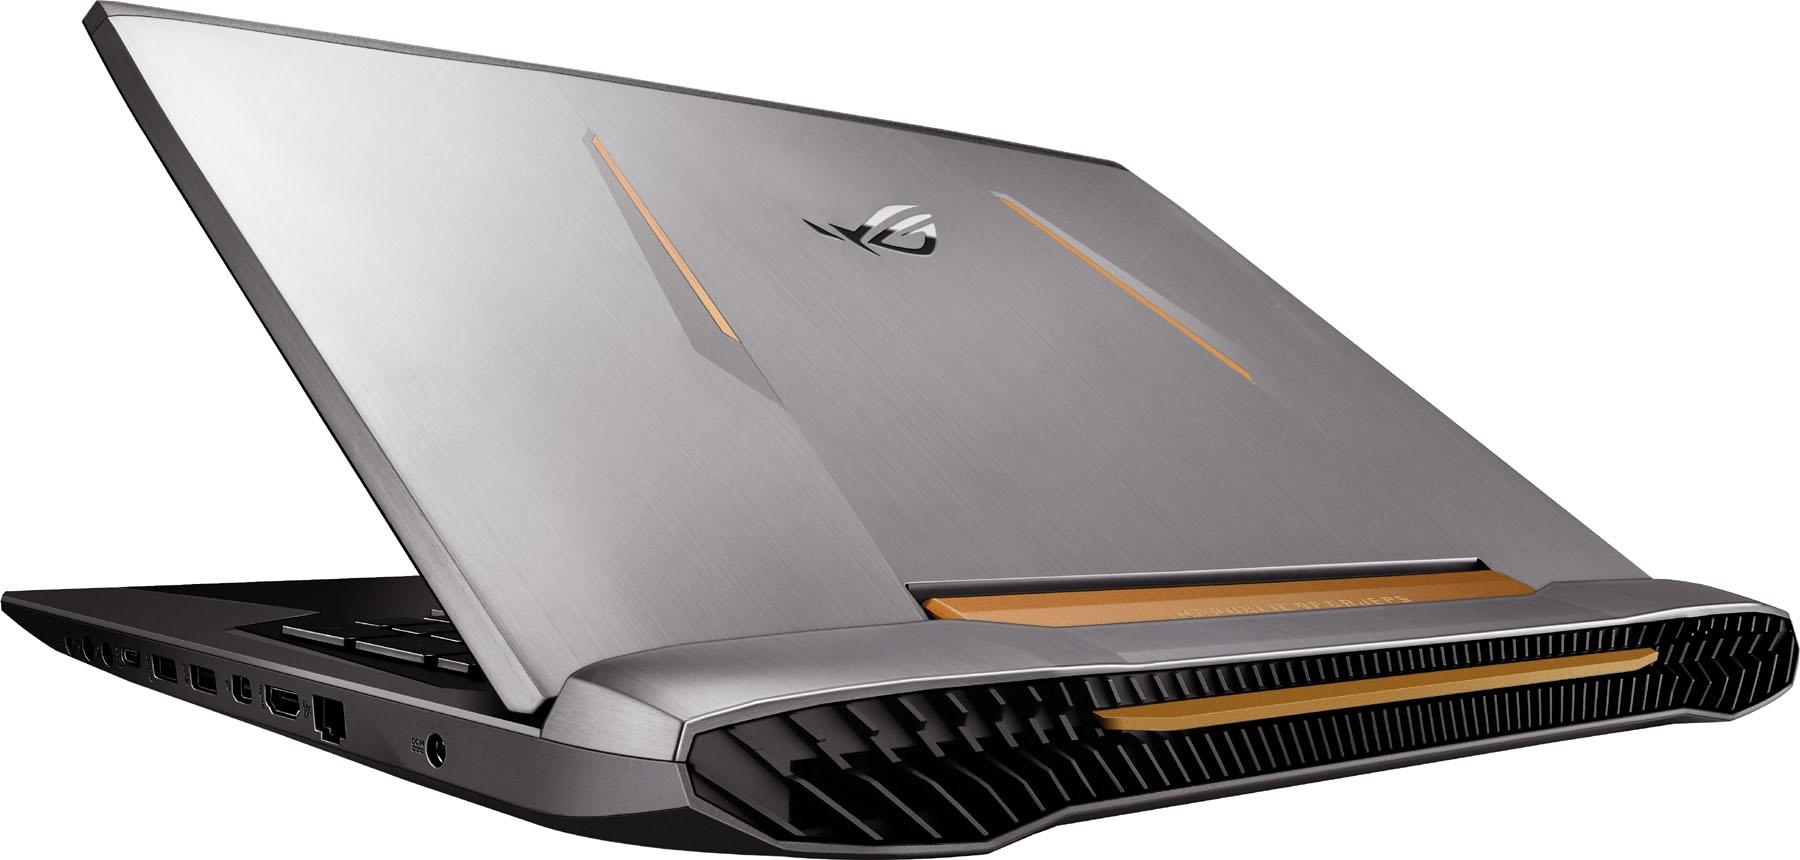 Asus ROG G752VS-XB72K OC Edition nVidia GTX 1070 8GB G-Sync